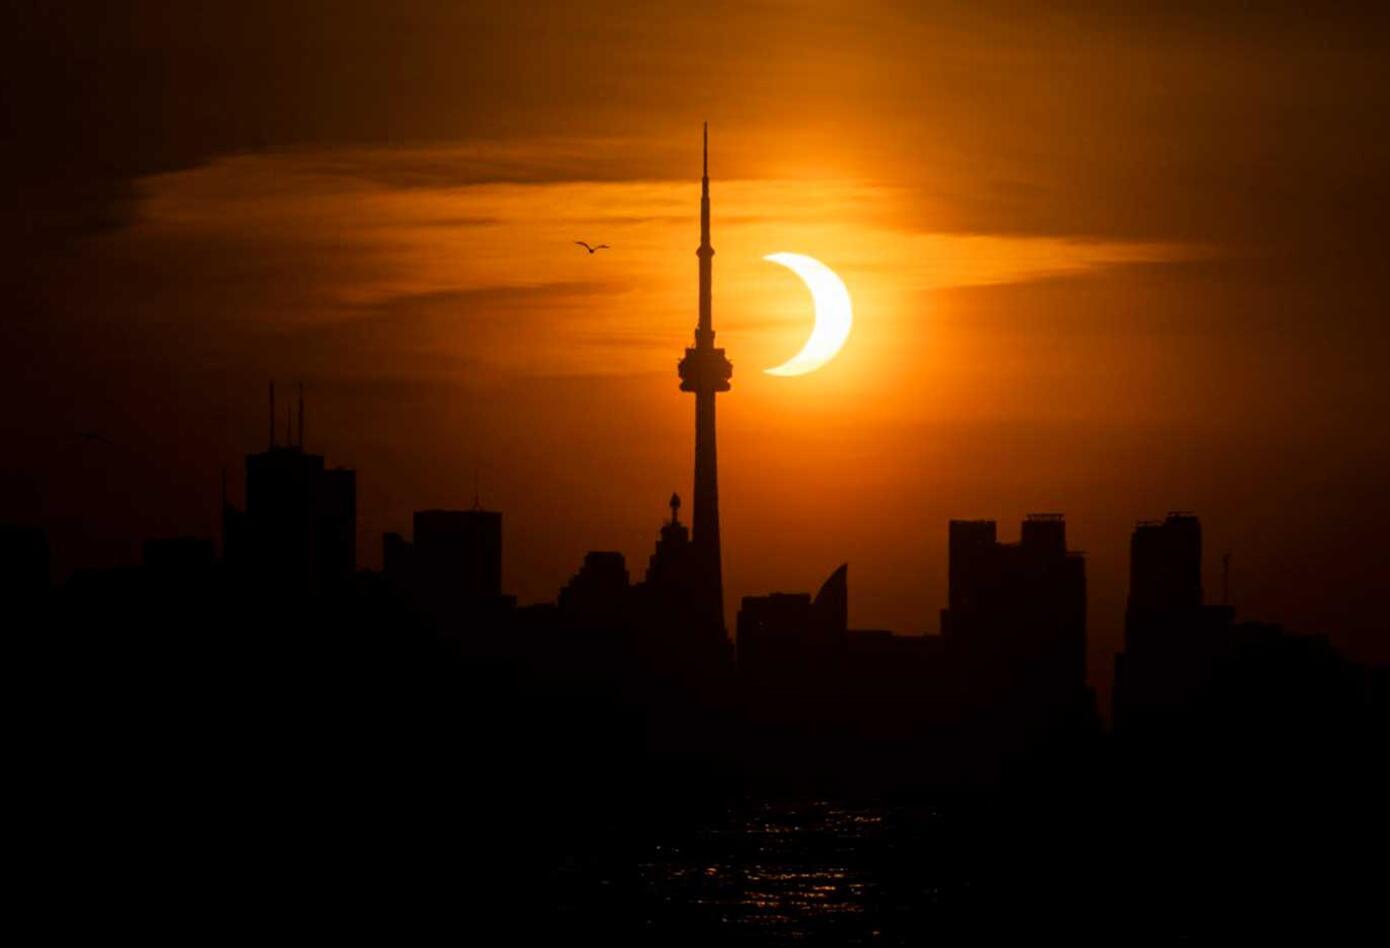 Eclipse anillo de fuego en Canadá